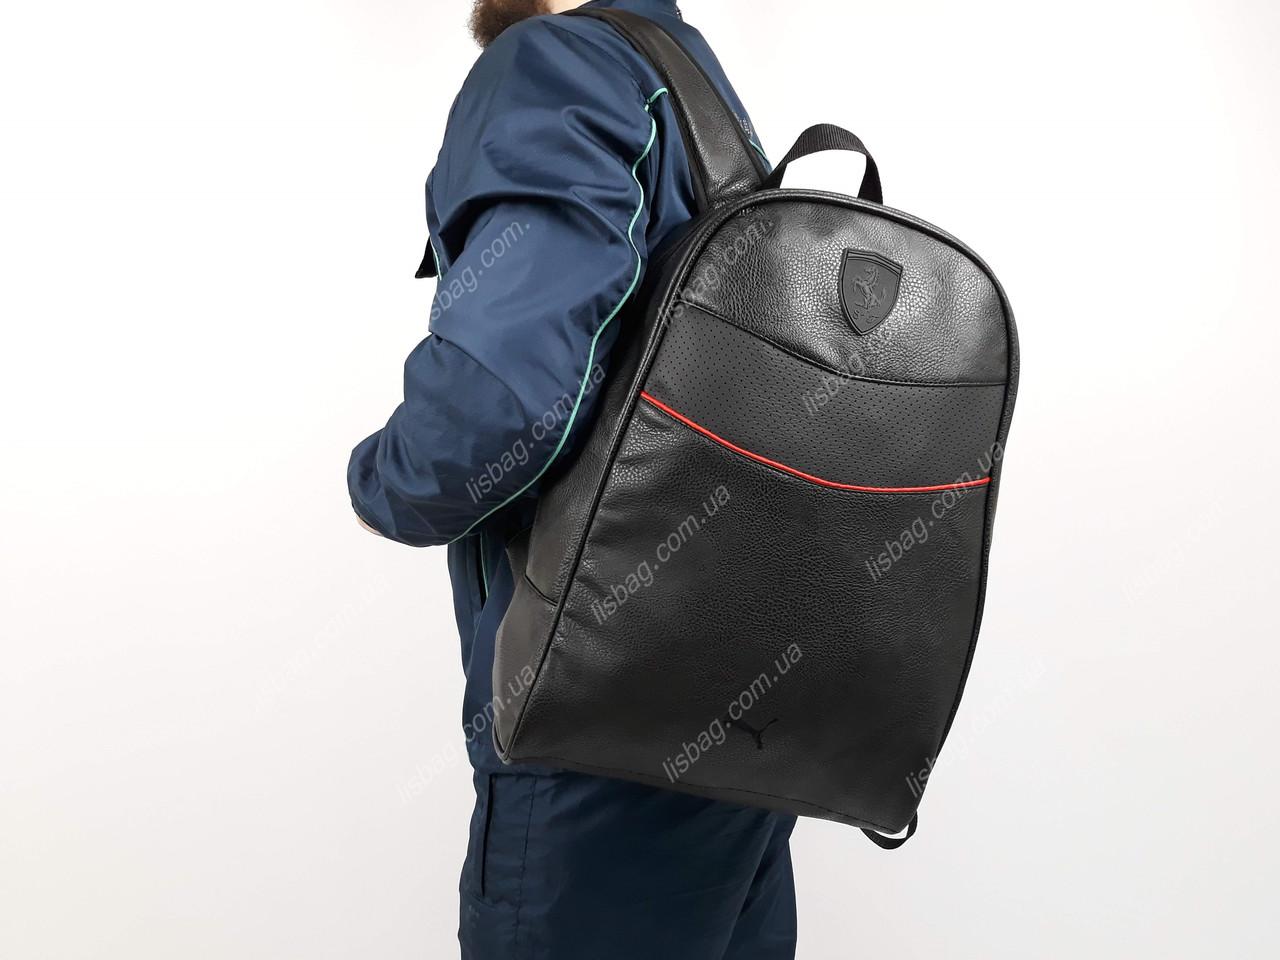 067655b75b81 Рюкзак Puma-Ferrari из кожи PU. Люкс модель спортивного типа новинка 2019  года